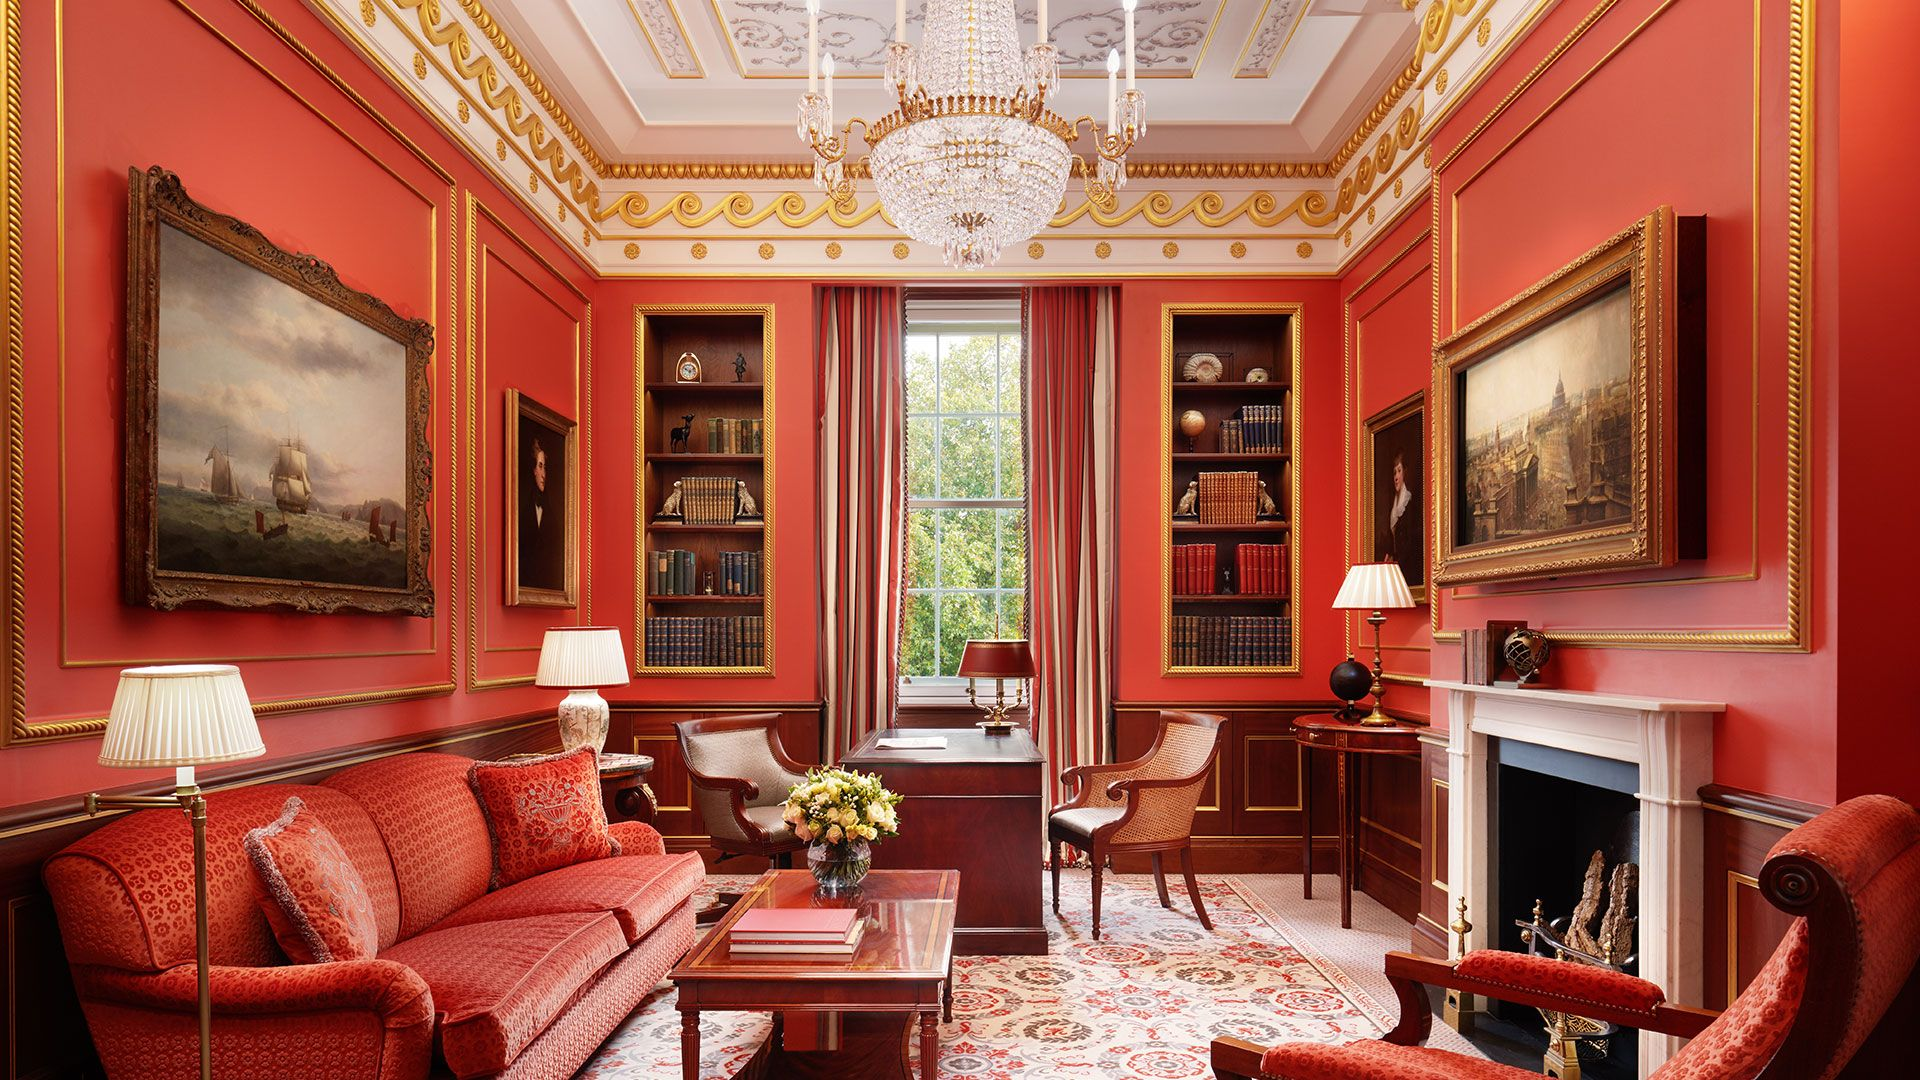 The Royal Suite The Lanesborough Hotel London Royal